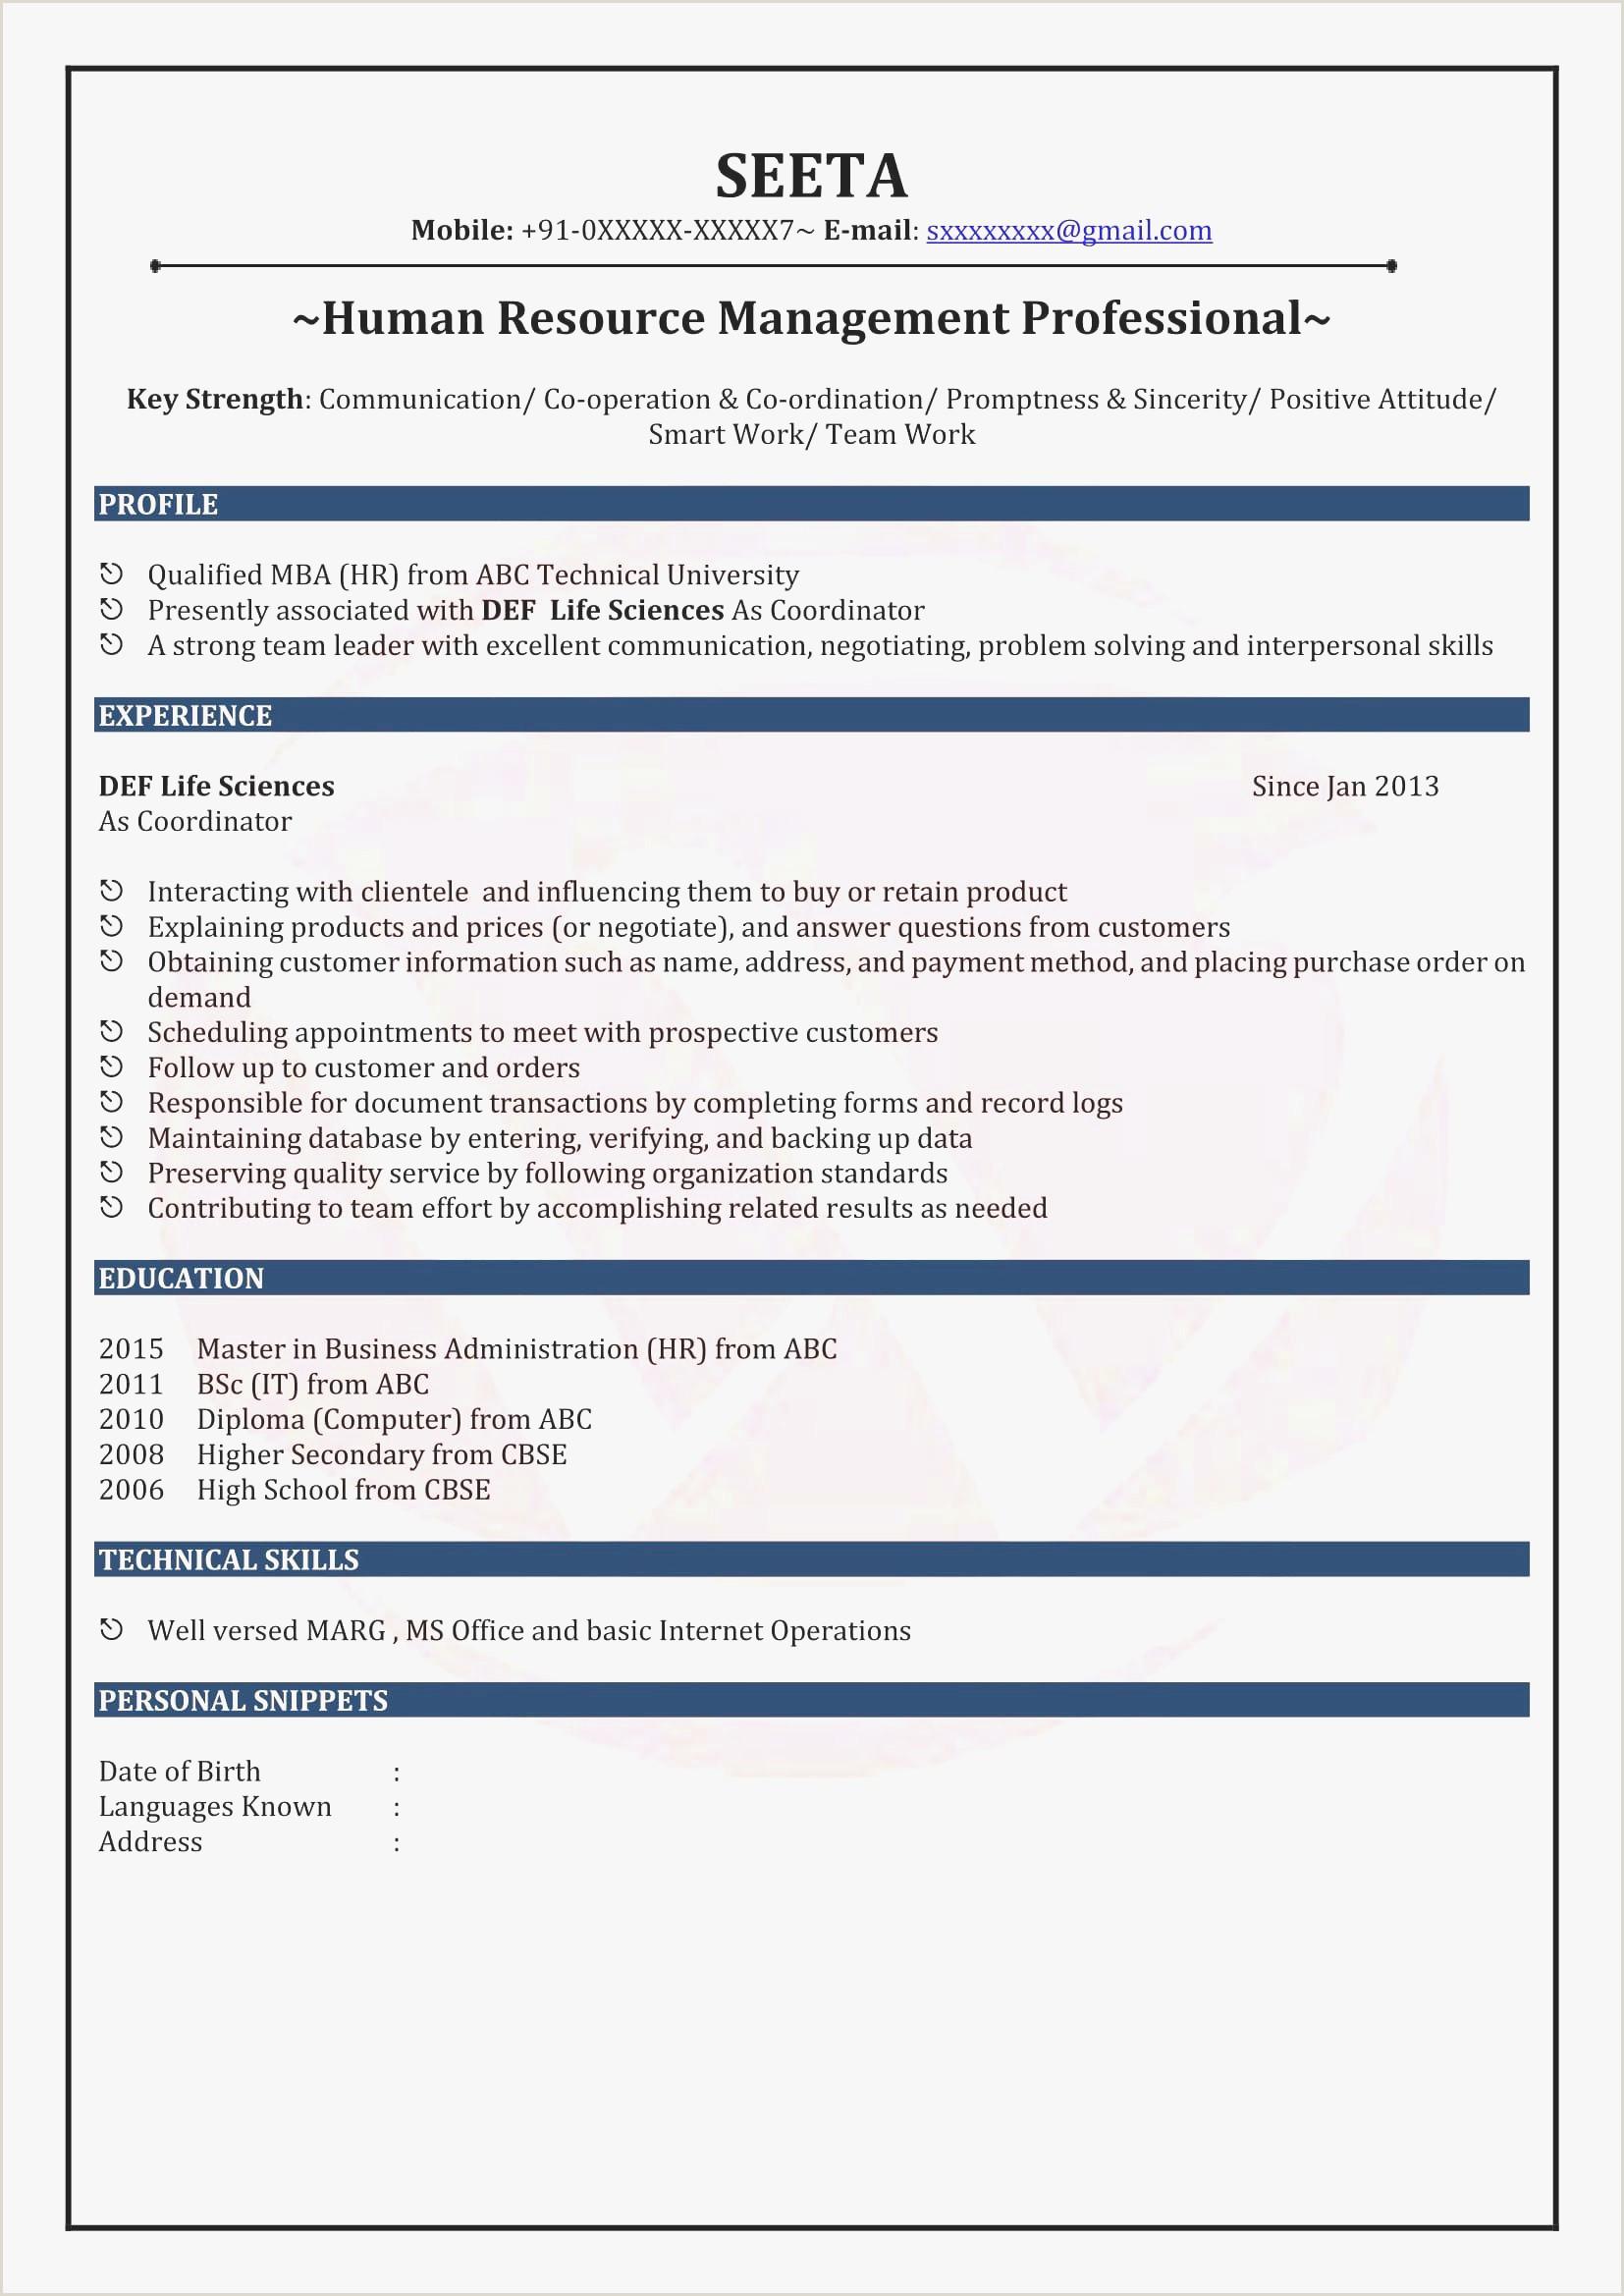 Fresher Resume format for 12th Pass Sample Resume format for Mba Hr Freshers New Sample Resume